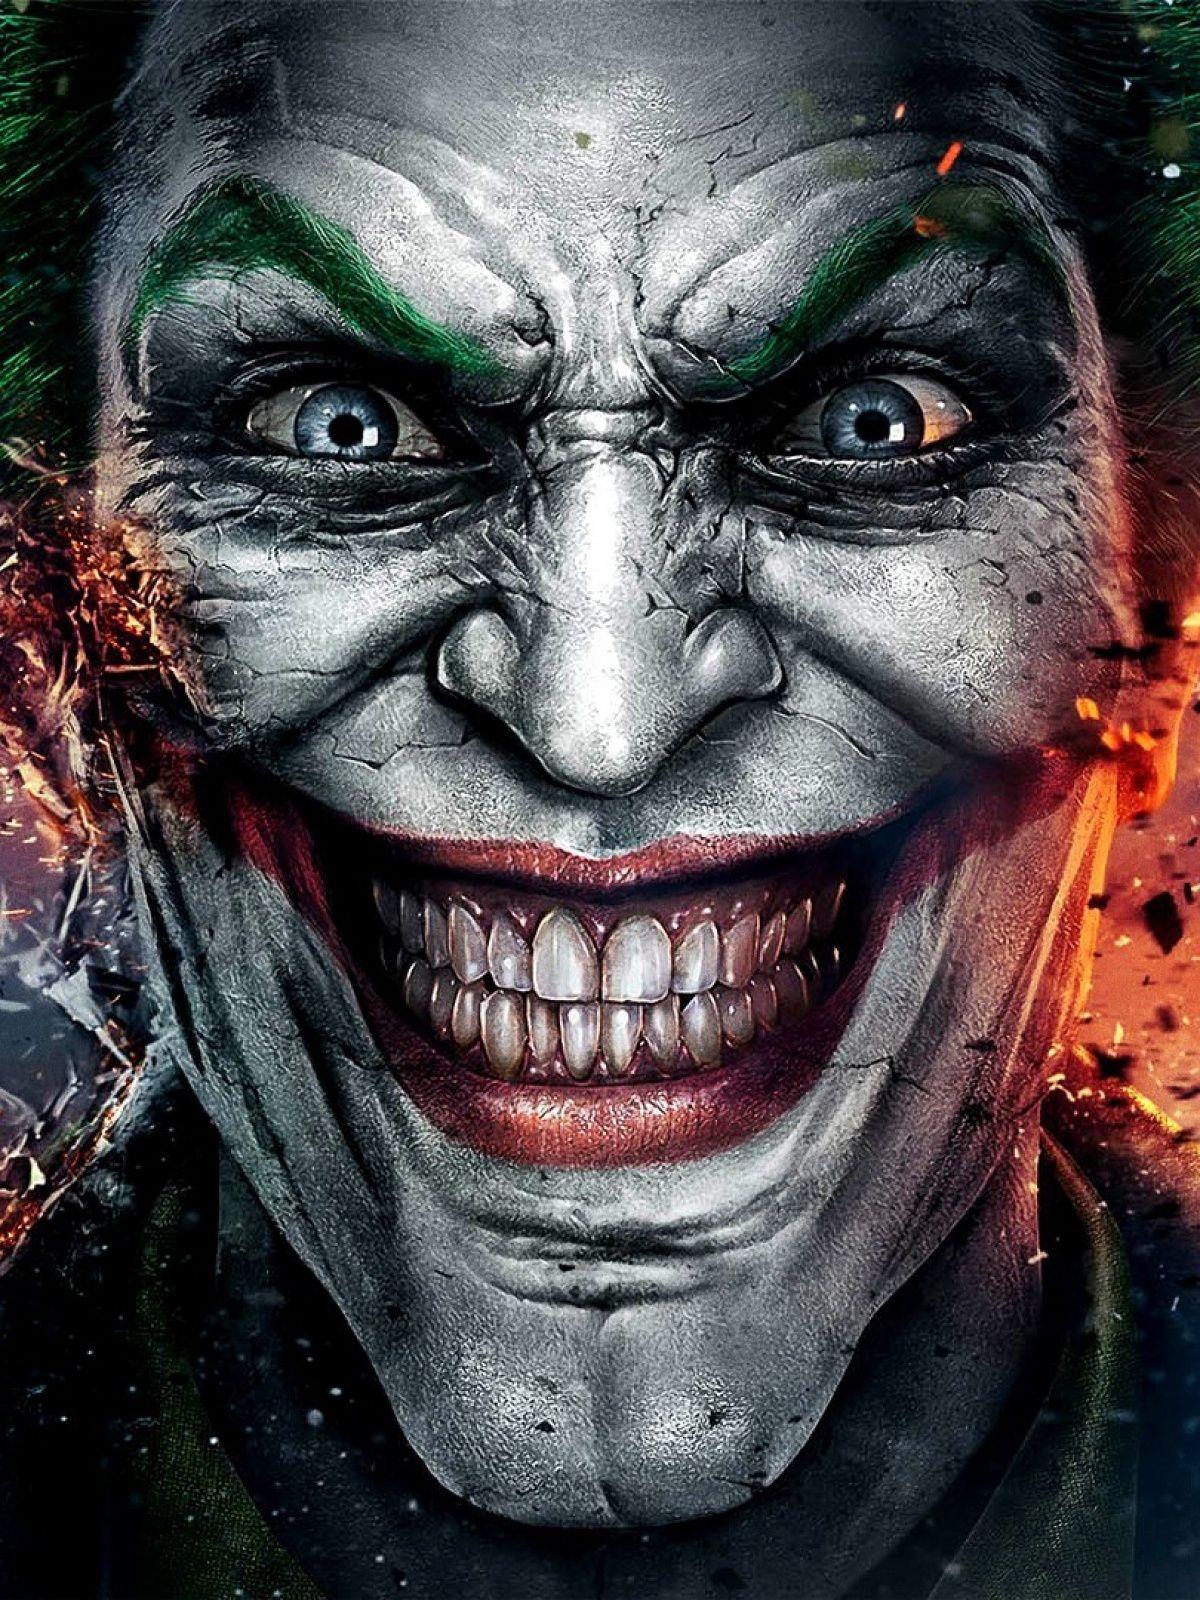 10 Most Popular Joker Wallpaper Hd Android Full Hd 1080p For Pc Desktop Joker Wallpapers Joker Face Joker Art